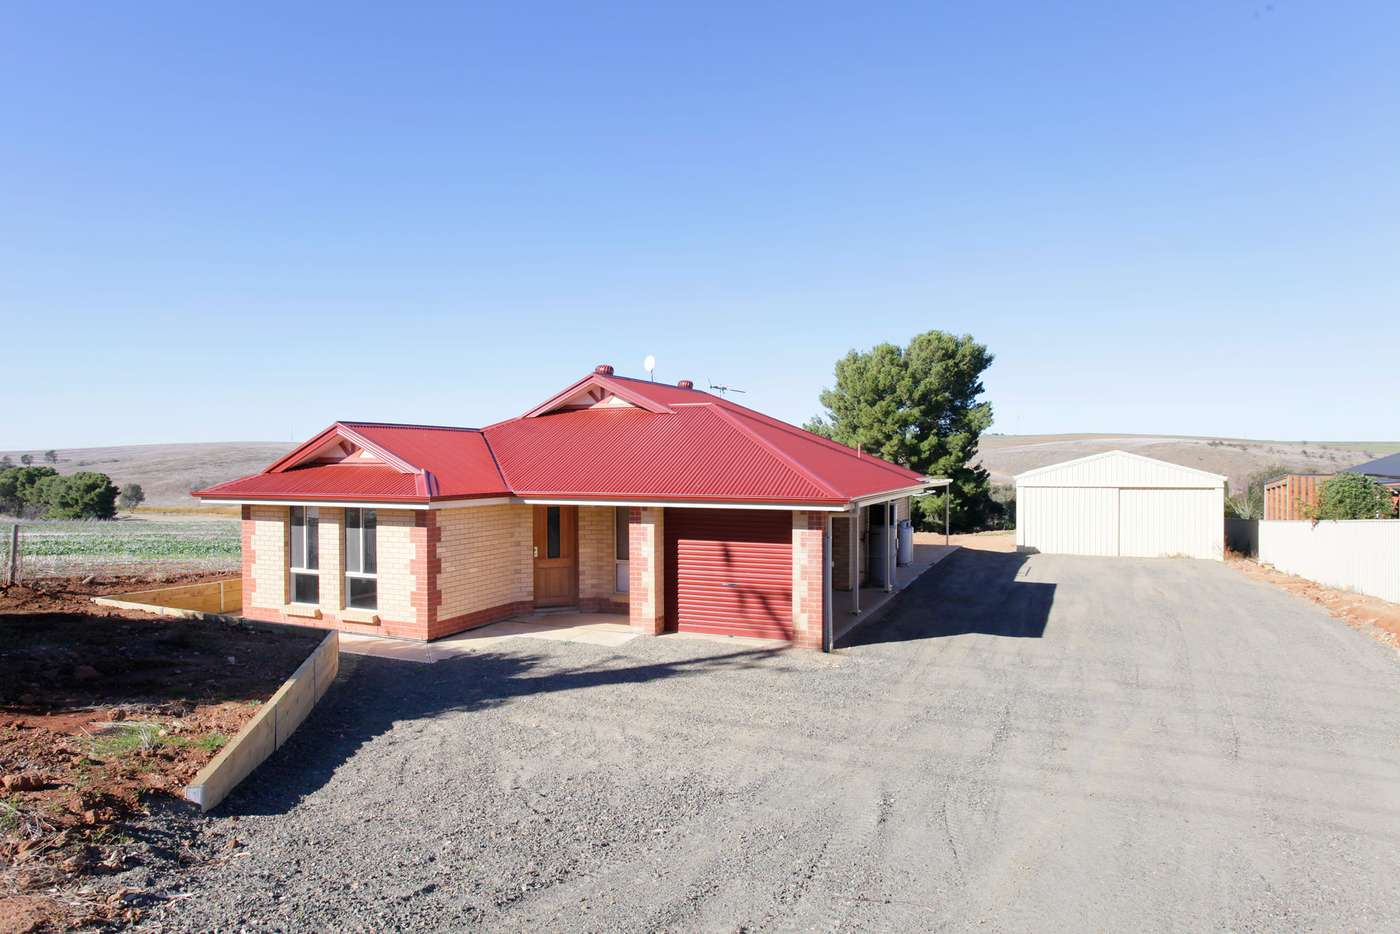 Main view of Homely house listing, 16 South Street, Hamley Bridge, SA 5401